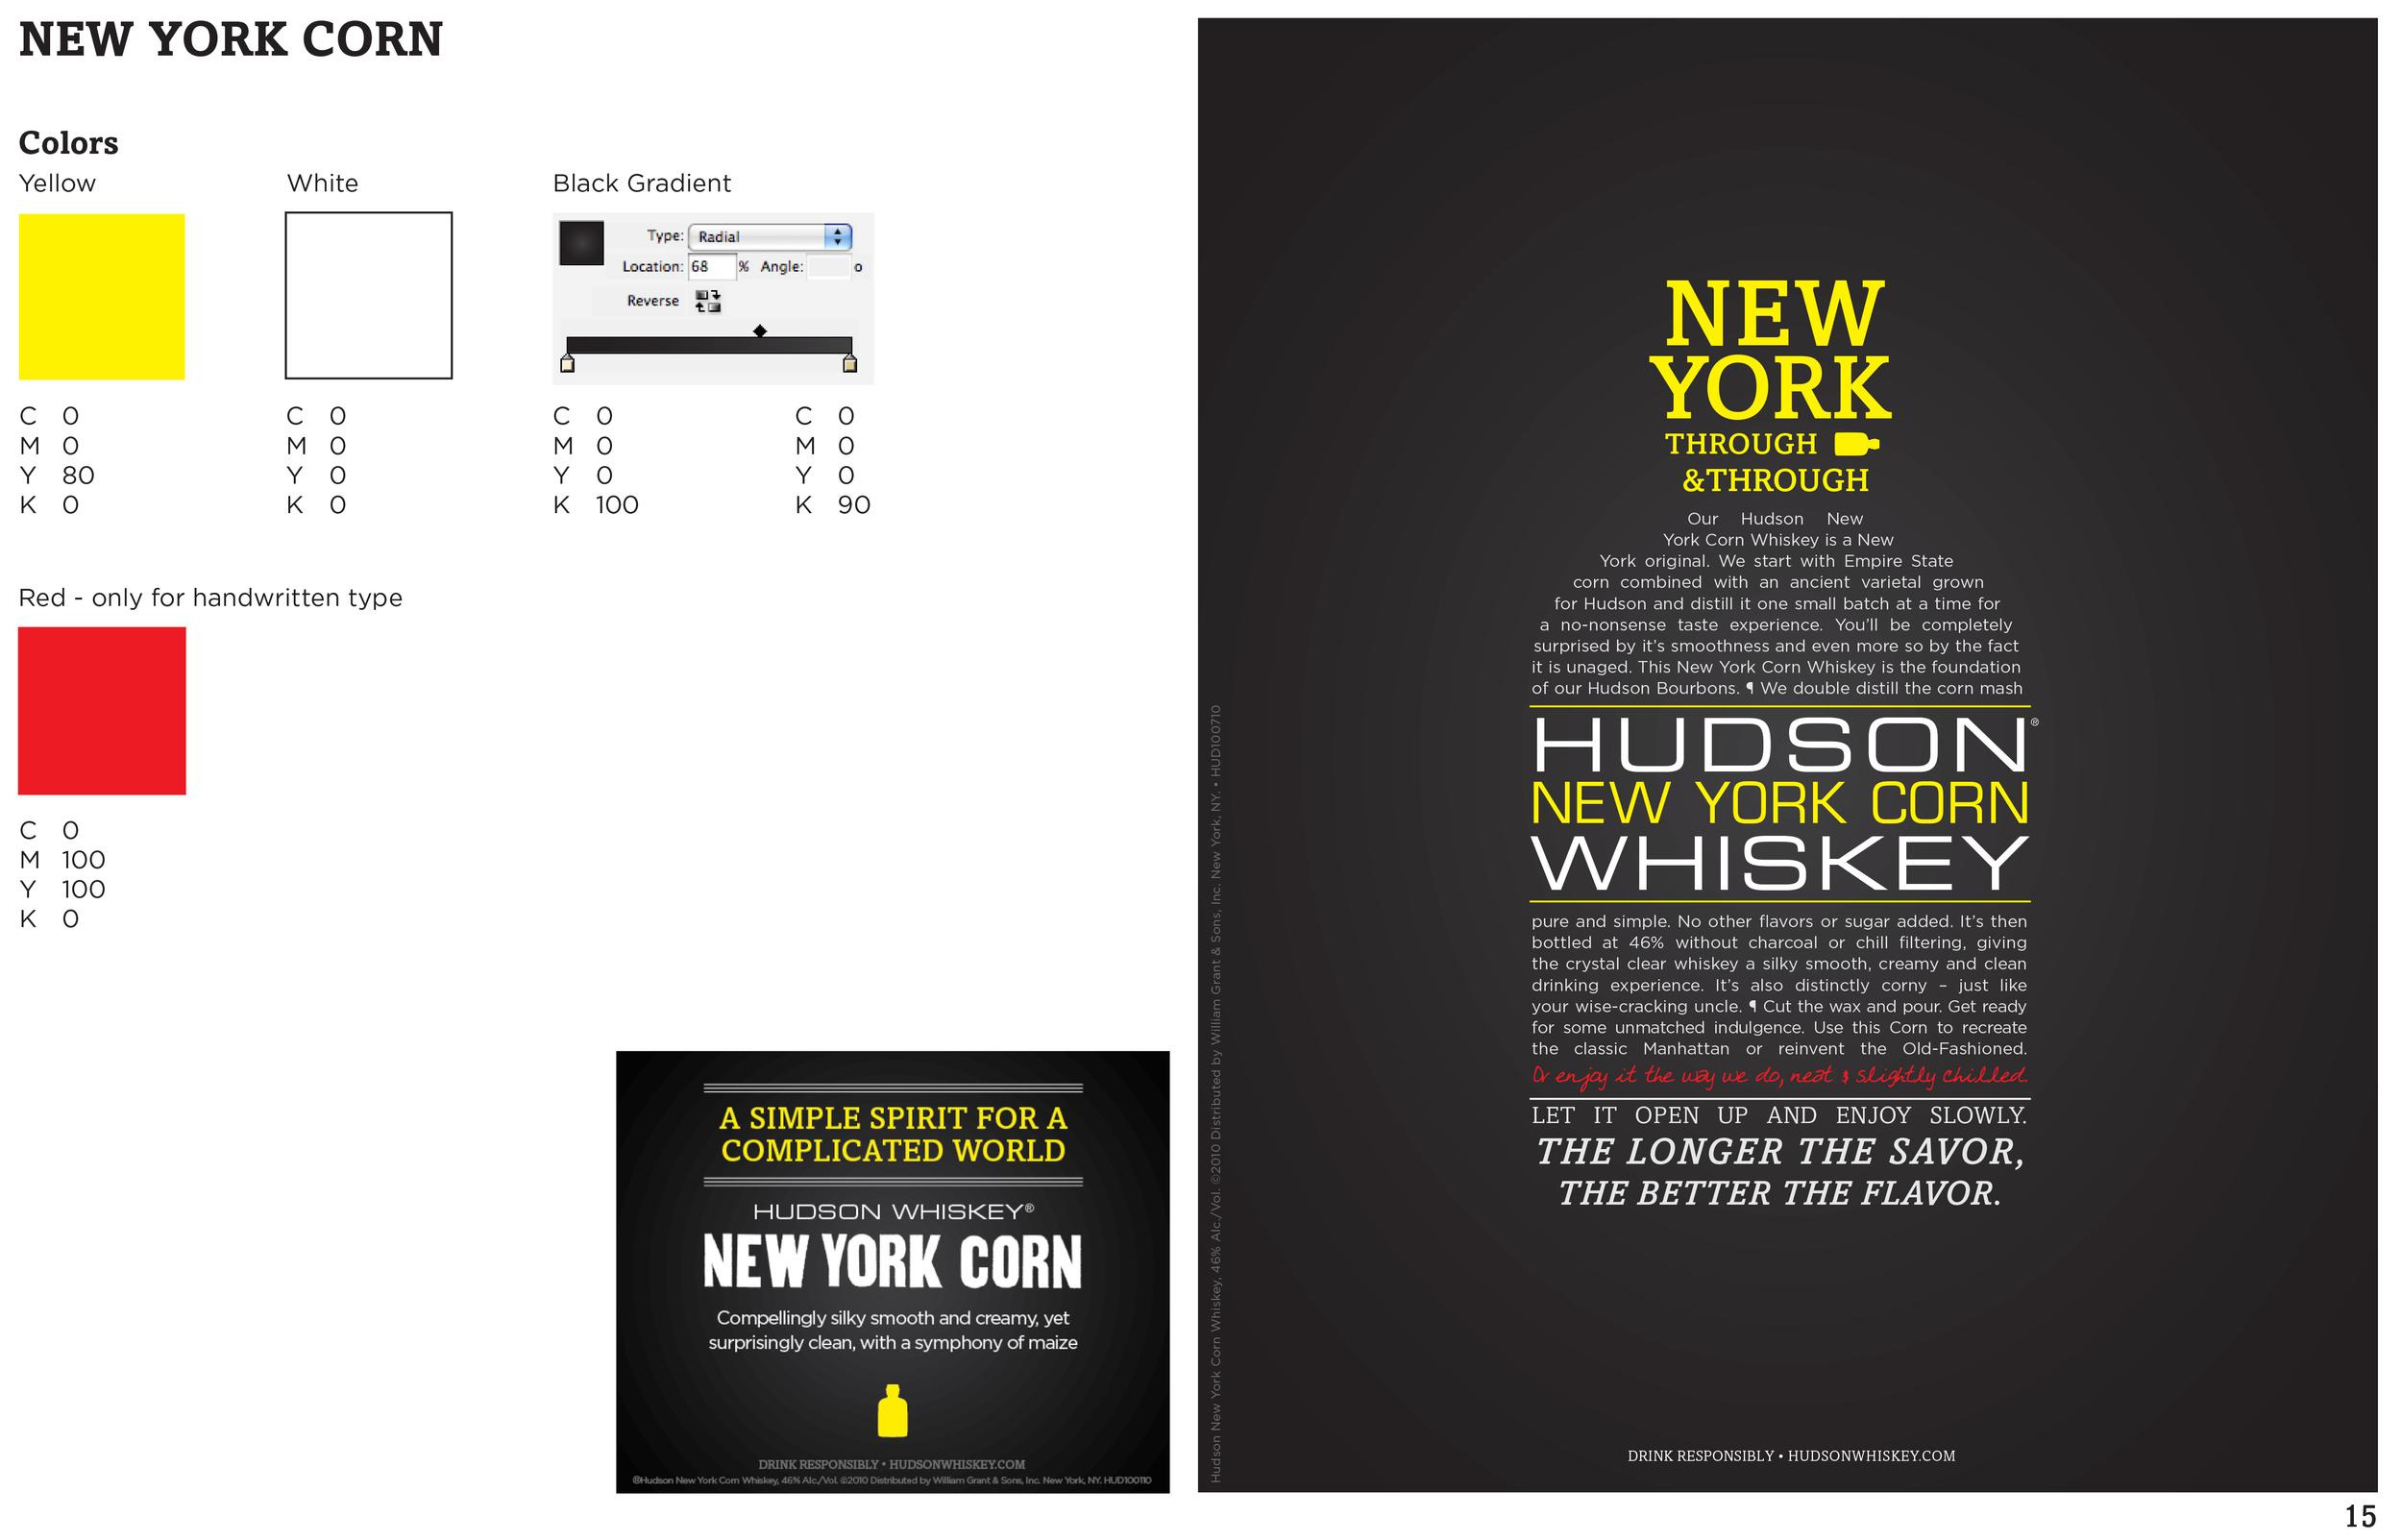 hudson-newlook-090910-15.jpg